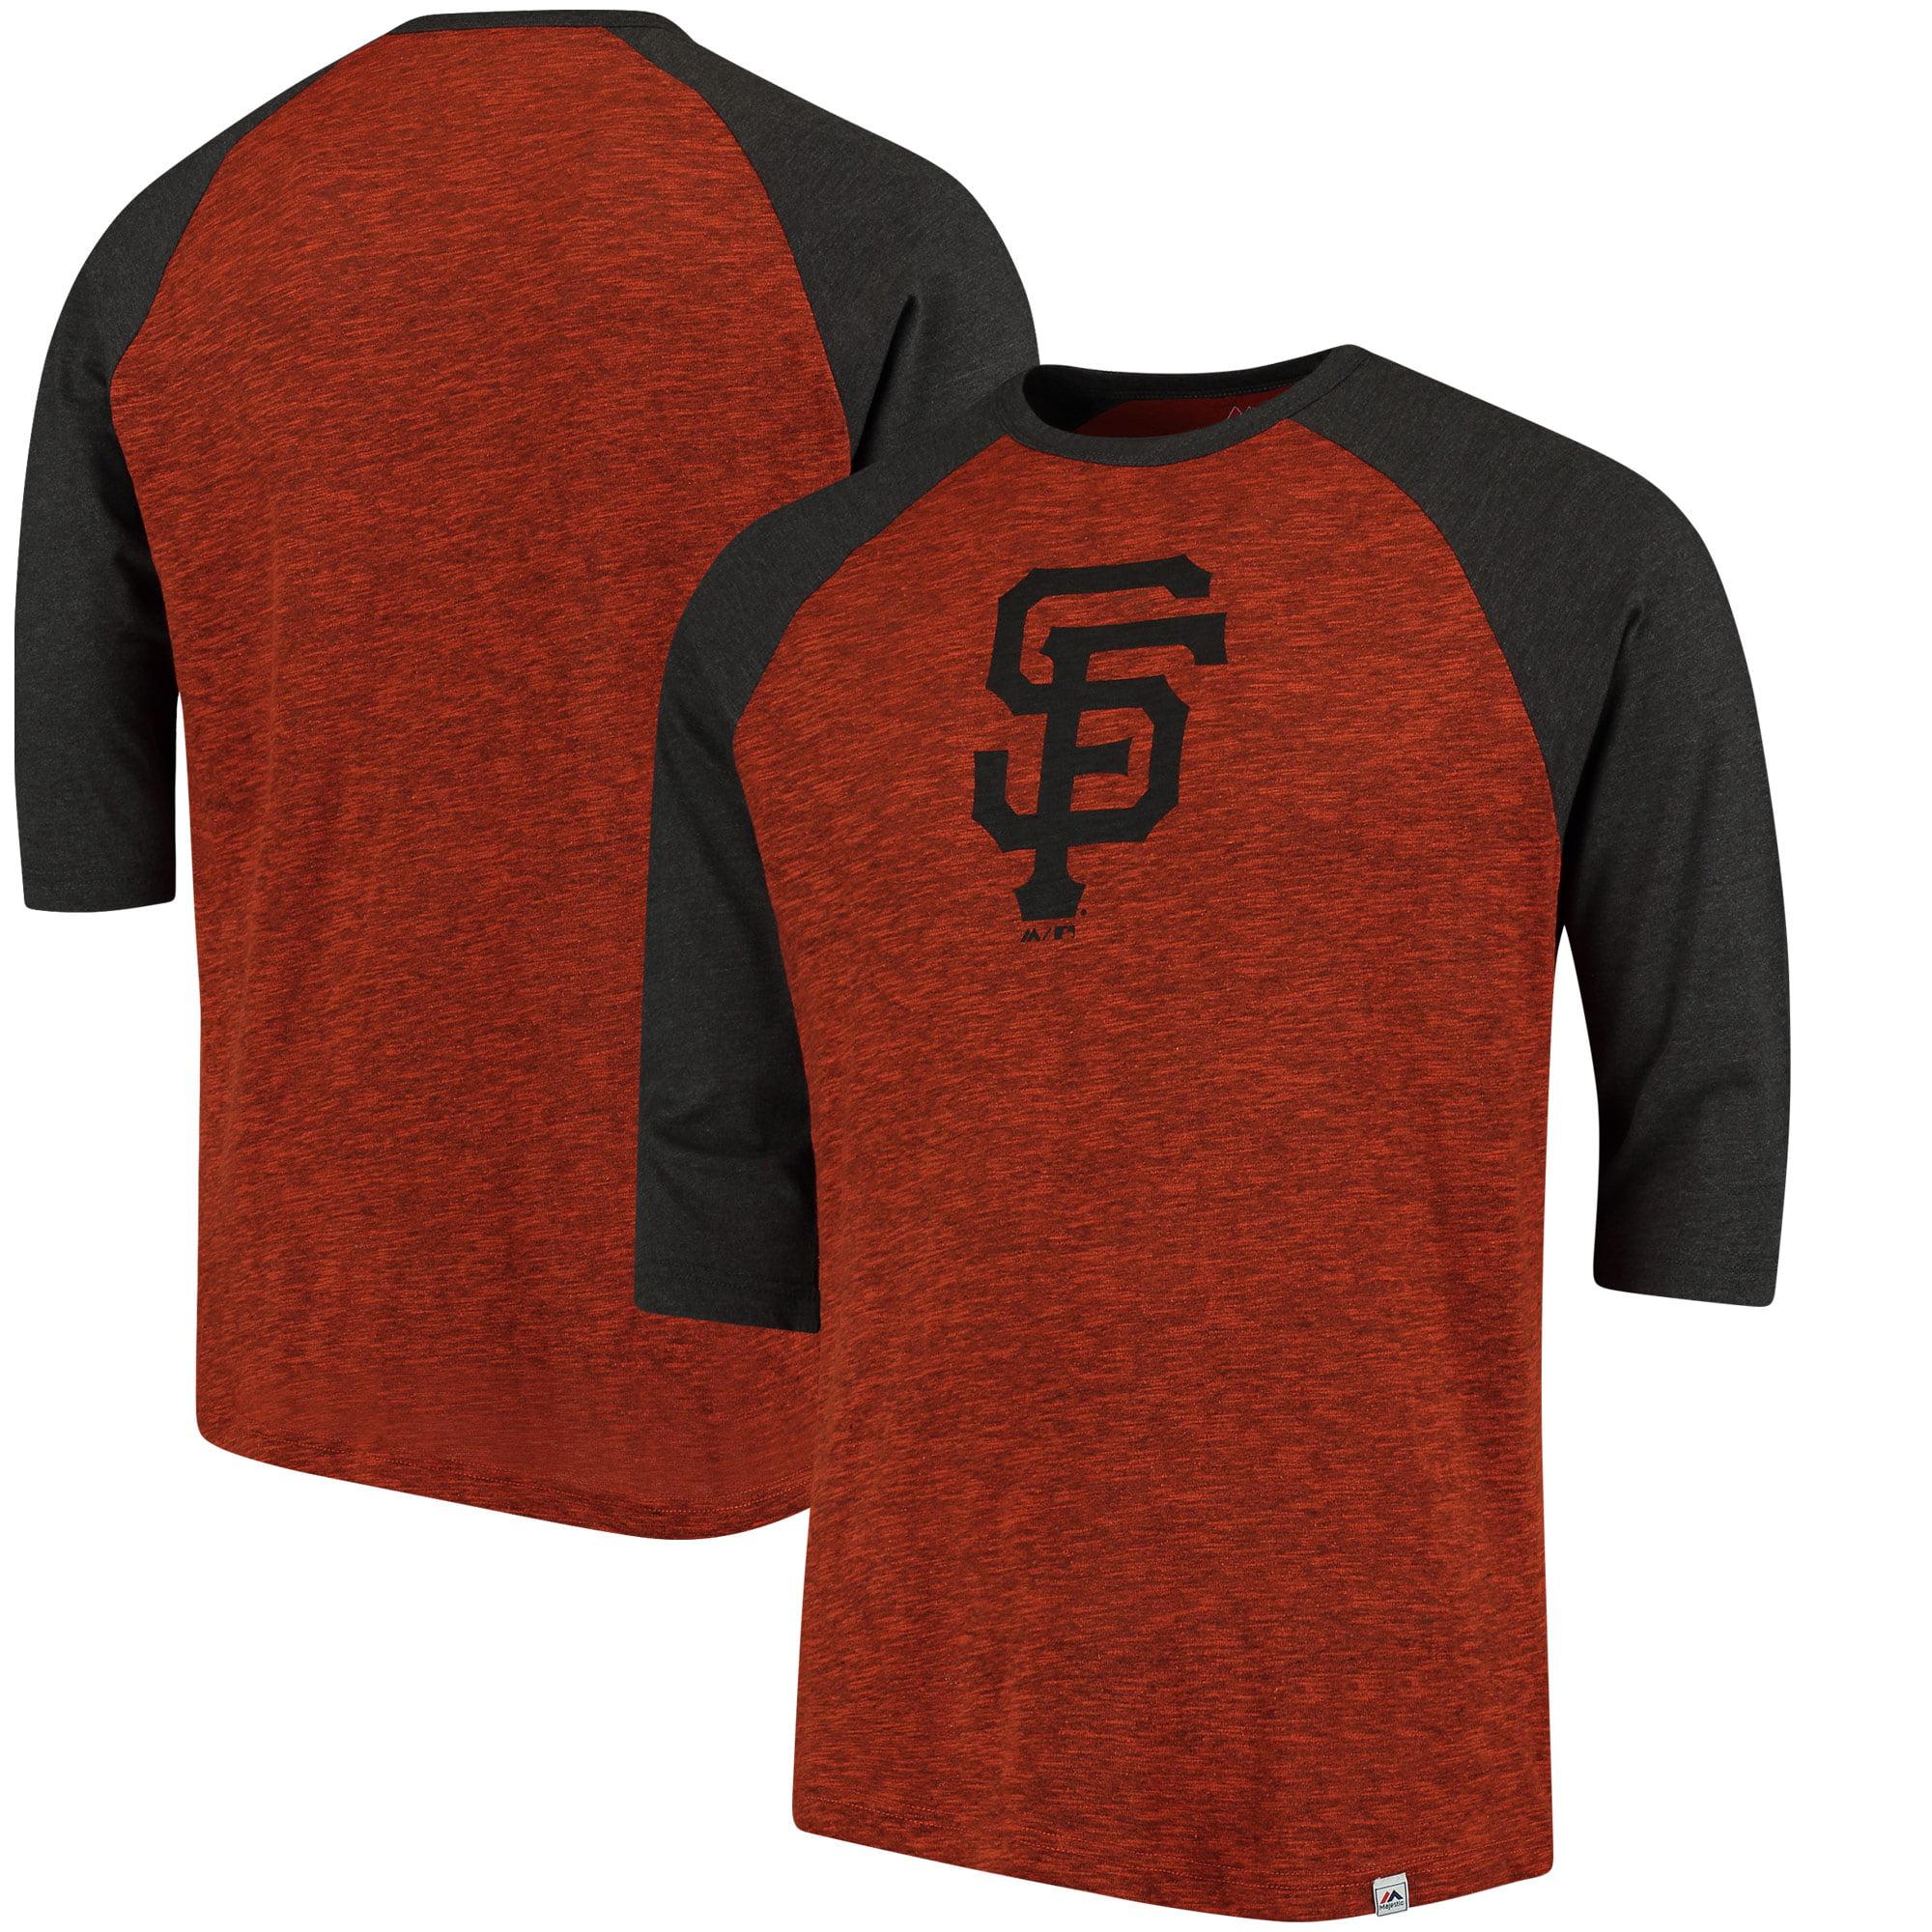 San Francisco Giants Majestic Grueling Ordeal 3/4-Sleeve Raglan T-Shirt - Orange